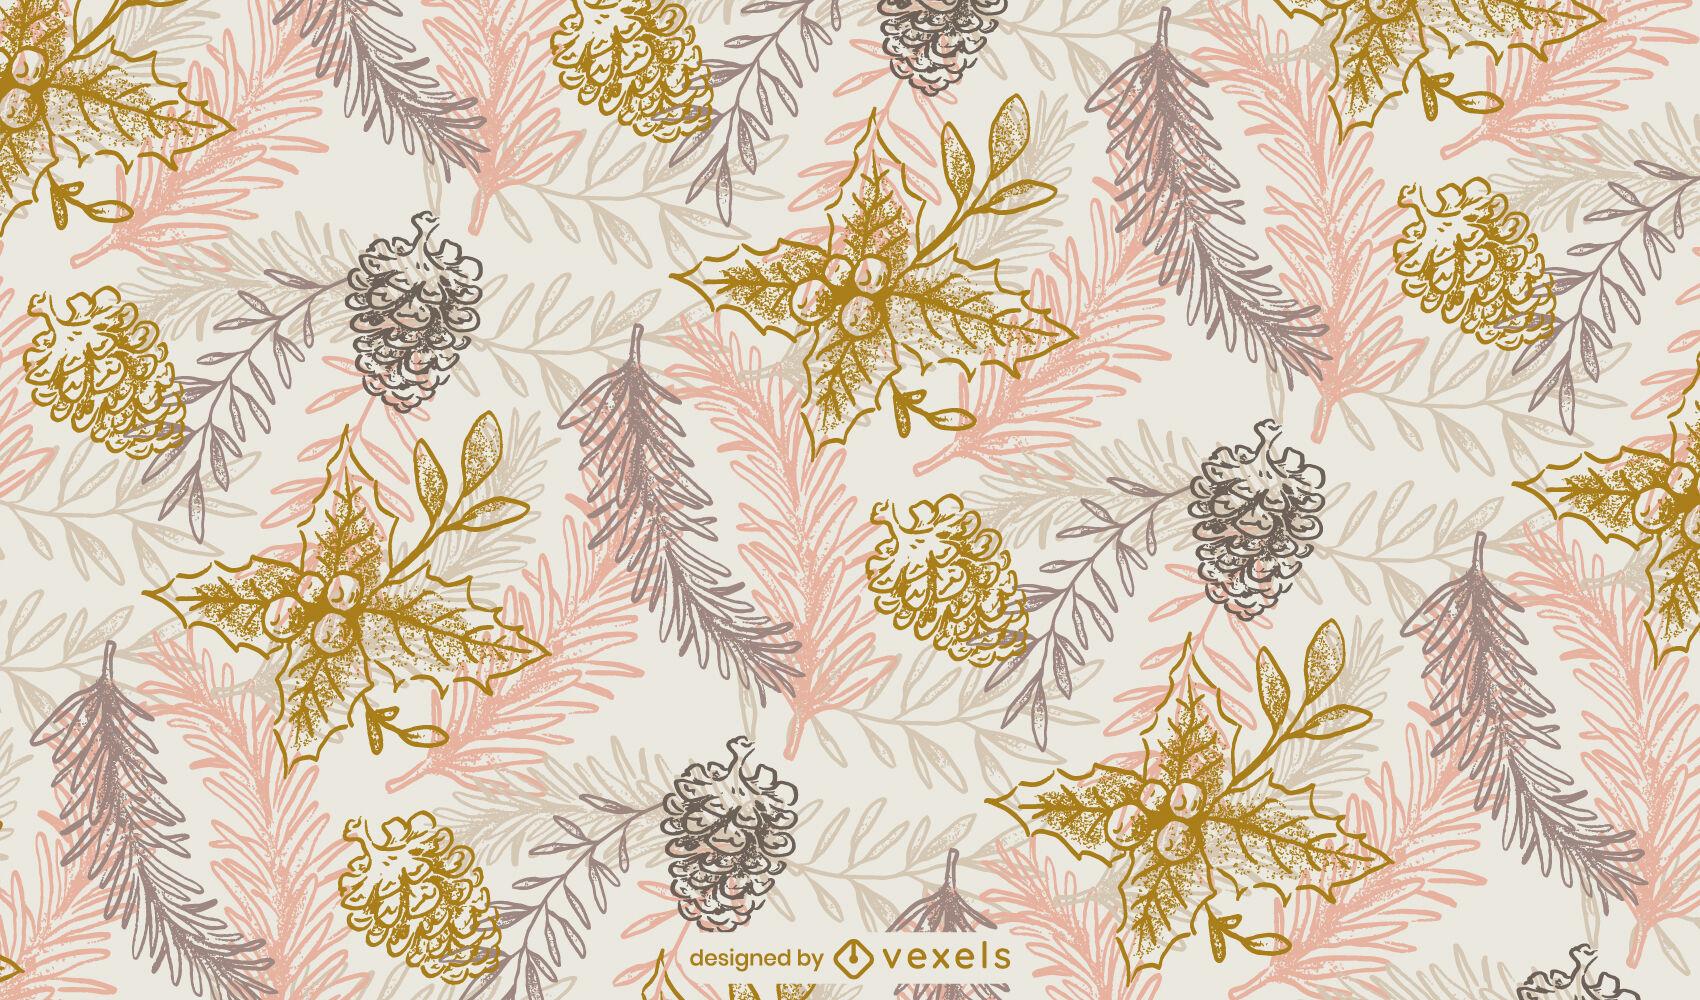 Mistletoe winter leaves pattern design